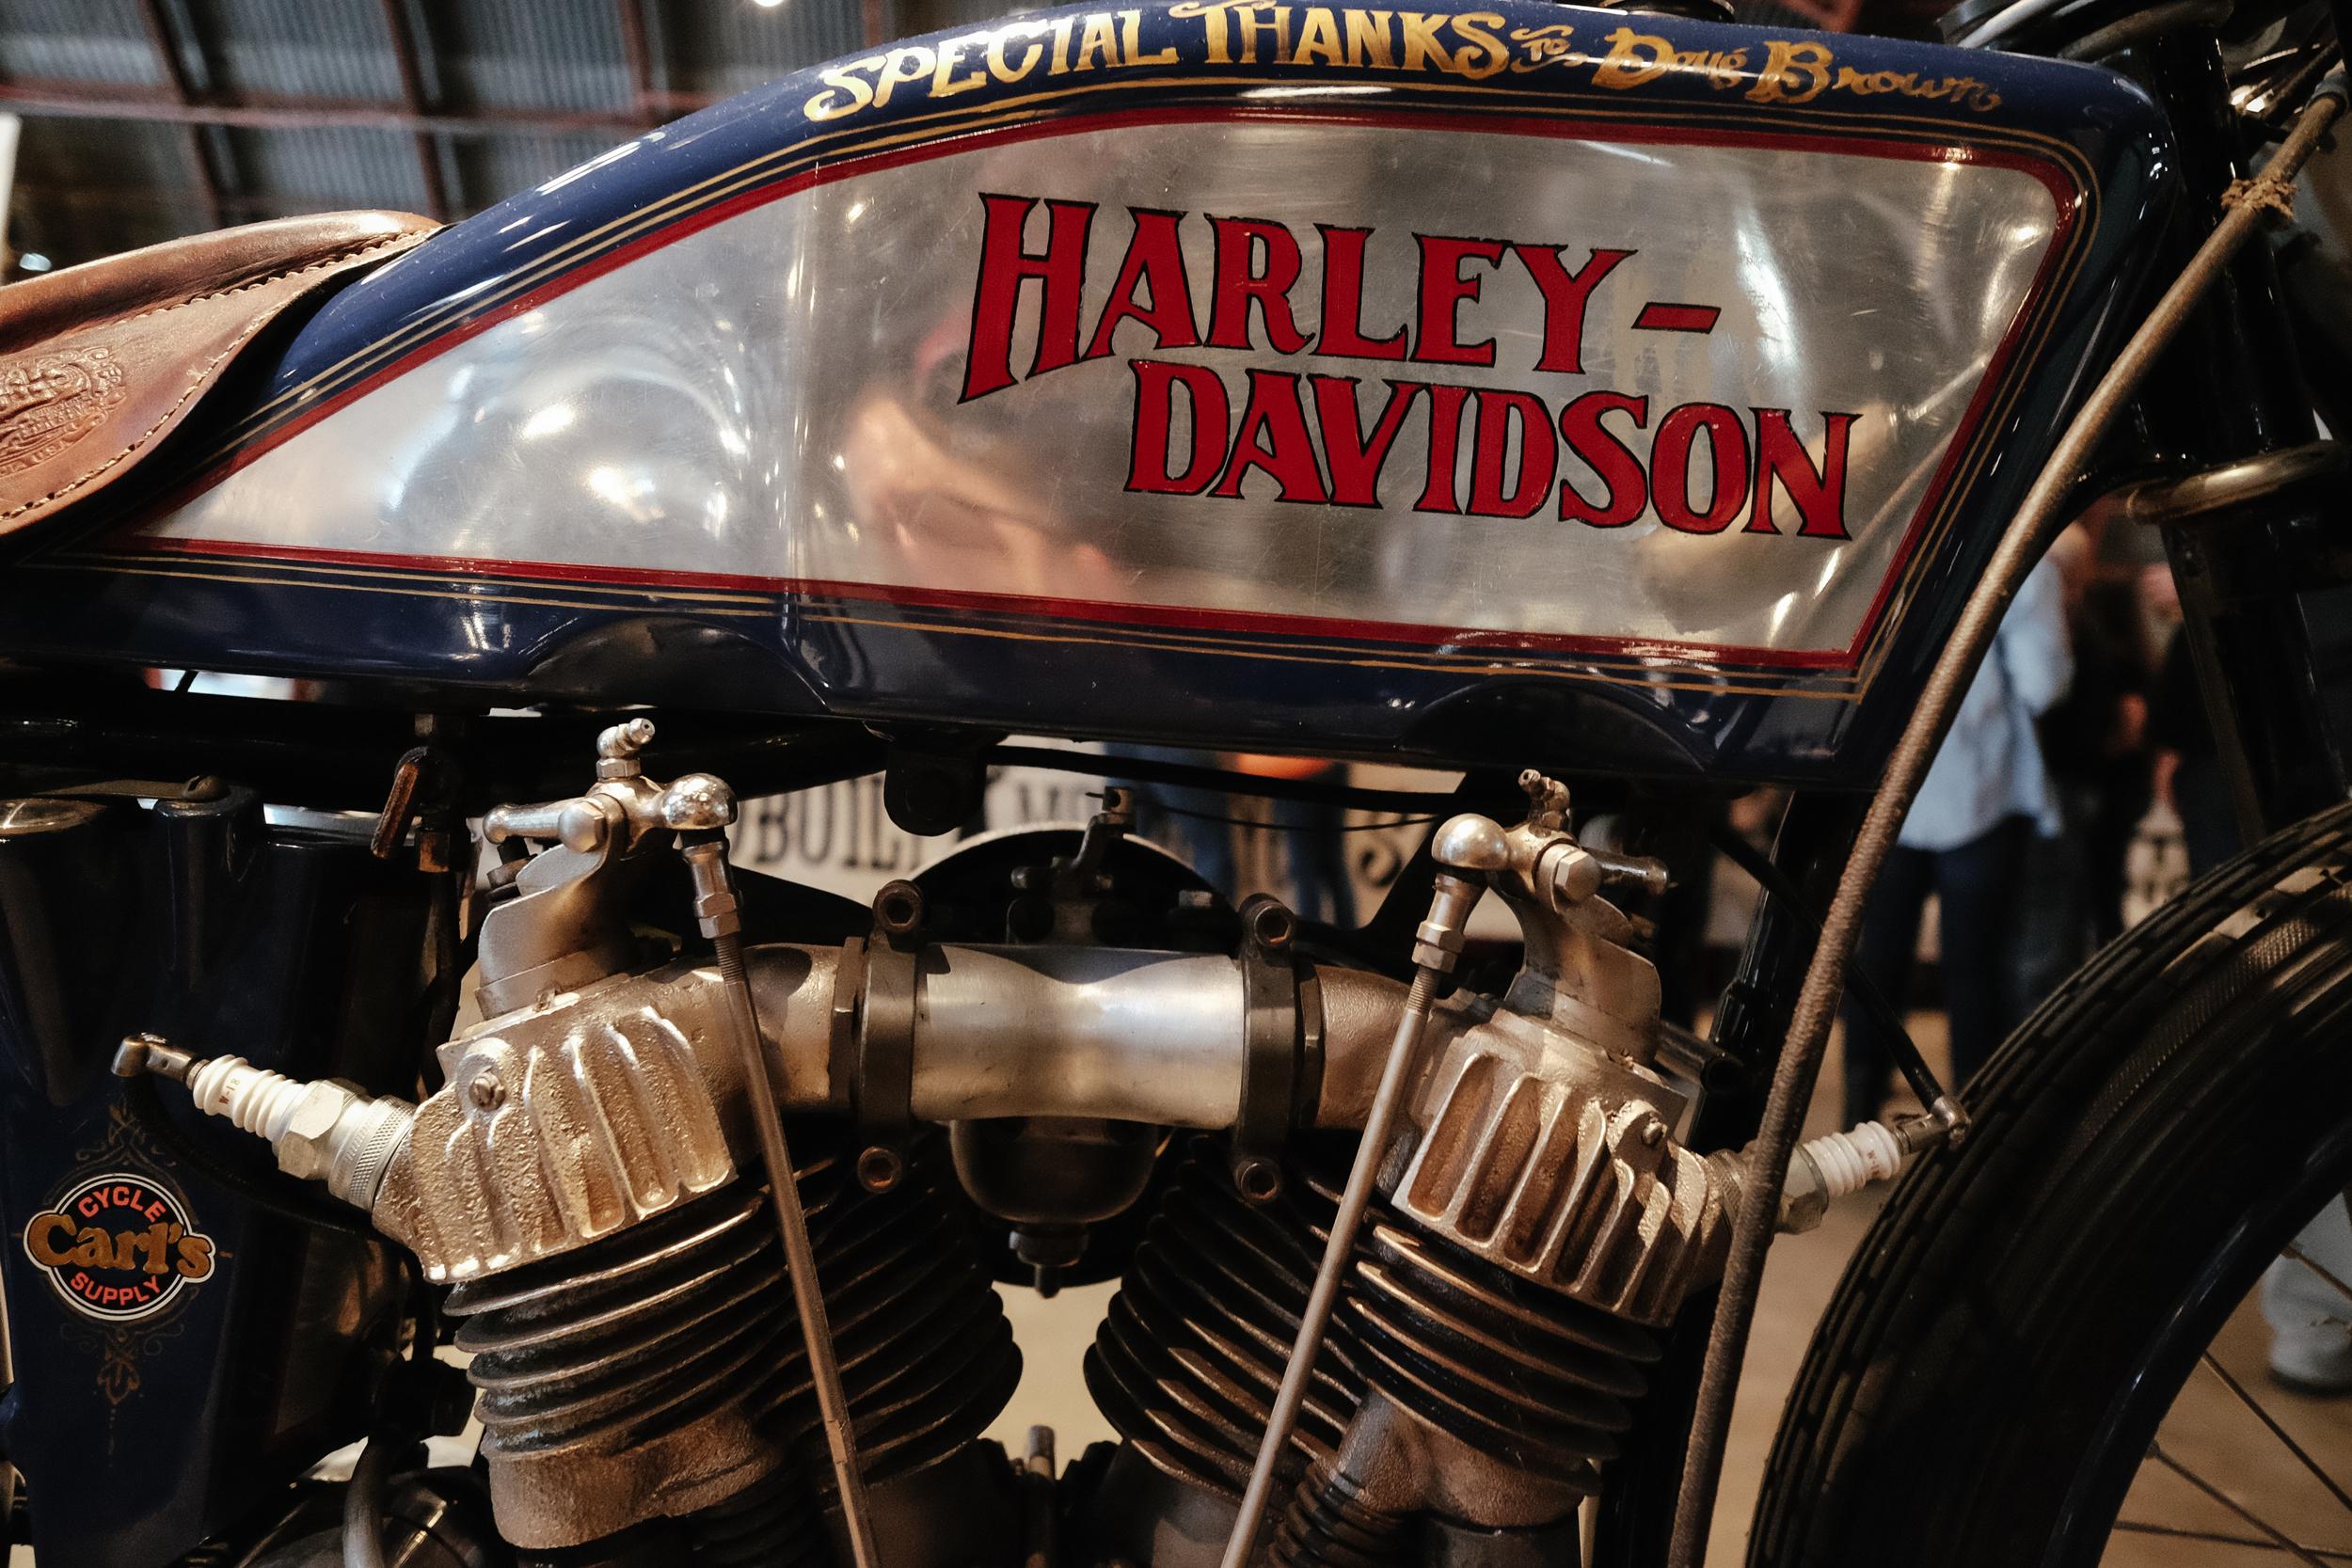 Handbuilt-Motorcycle-Show-2015-8234.jpg